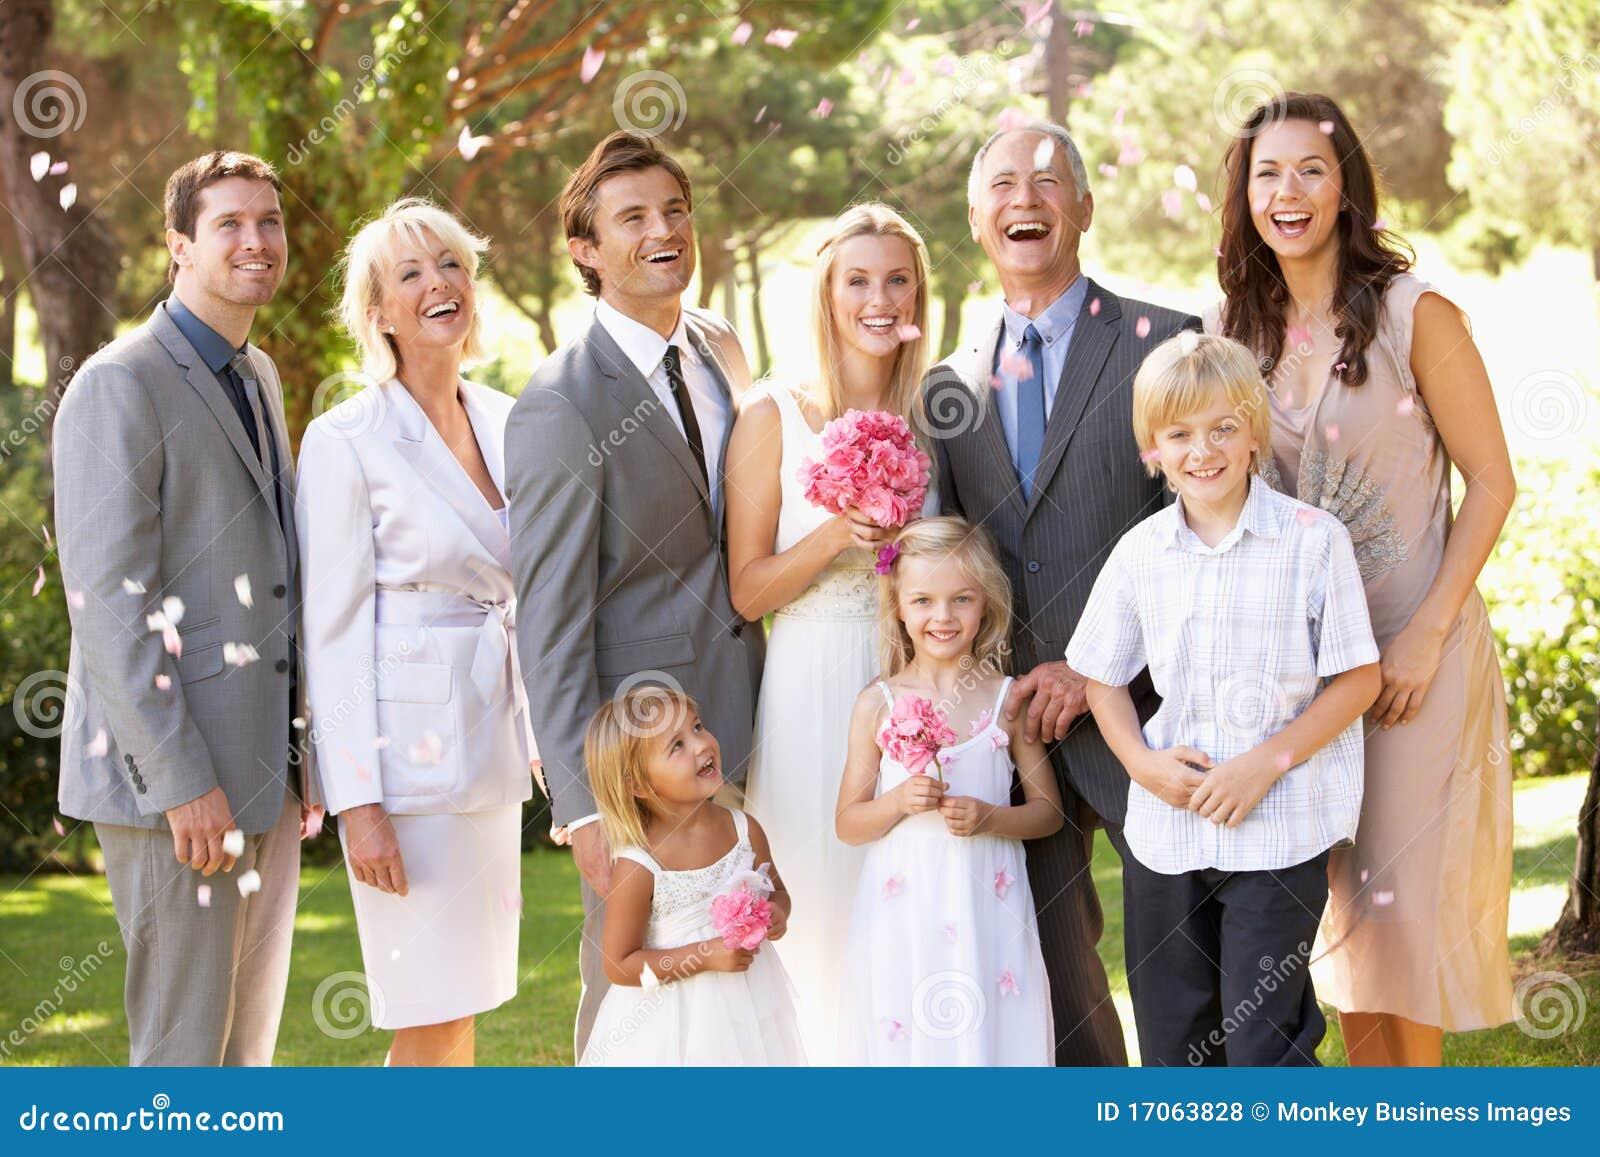 Family Group At Wedding Royalty Free Stock Photos Image